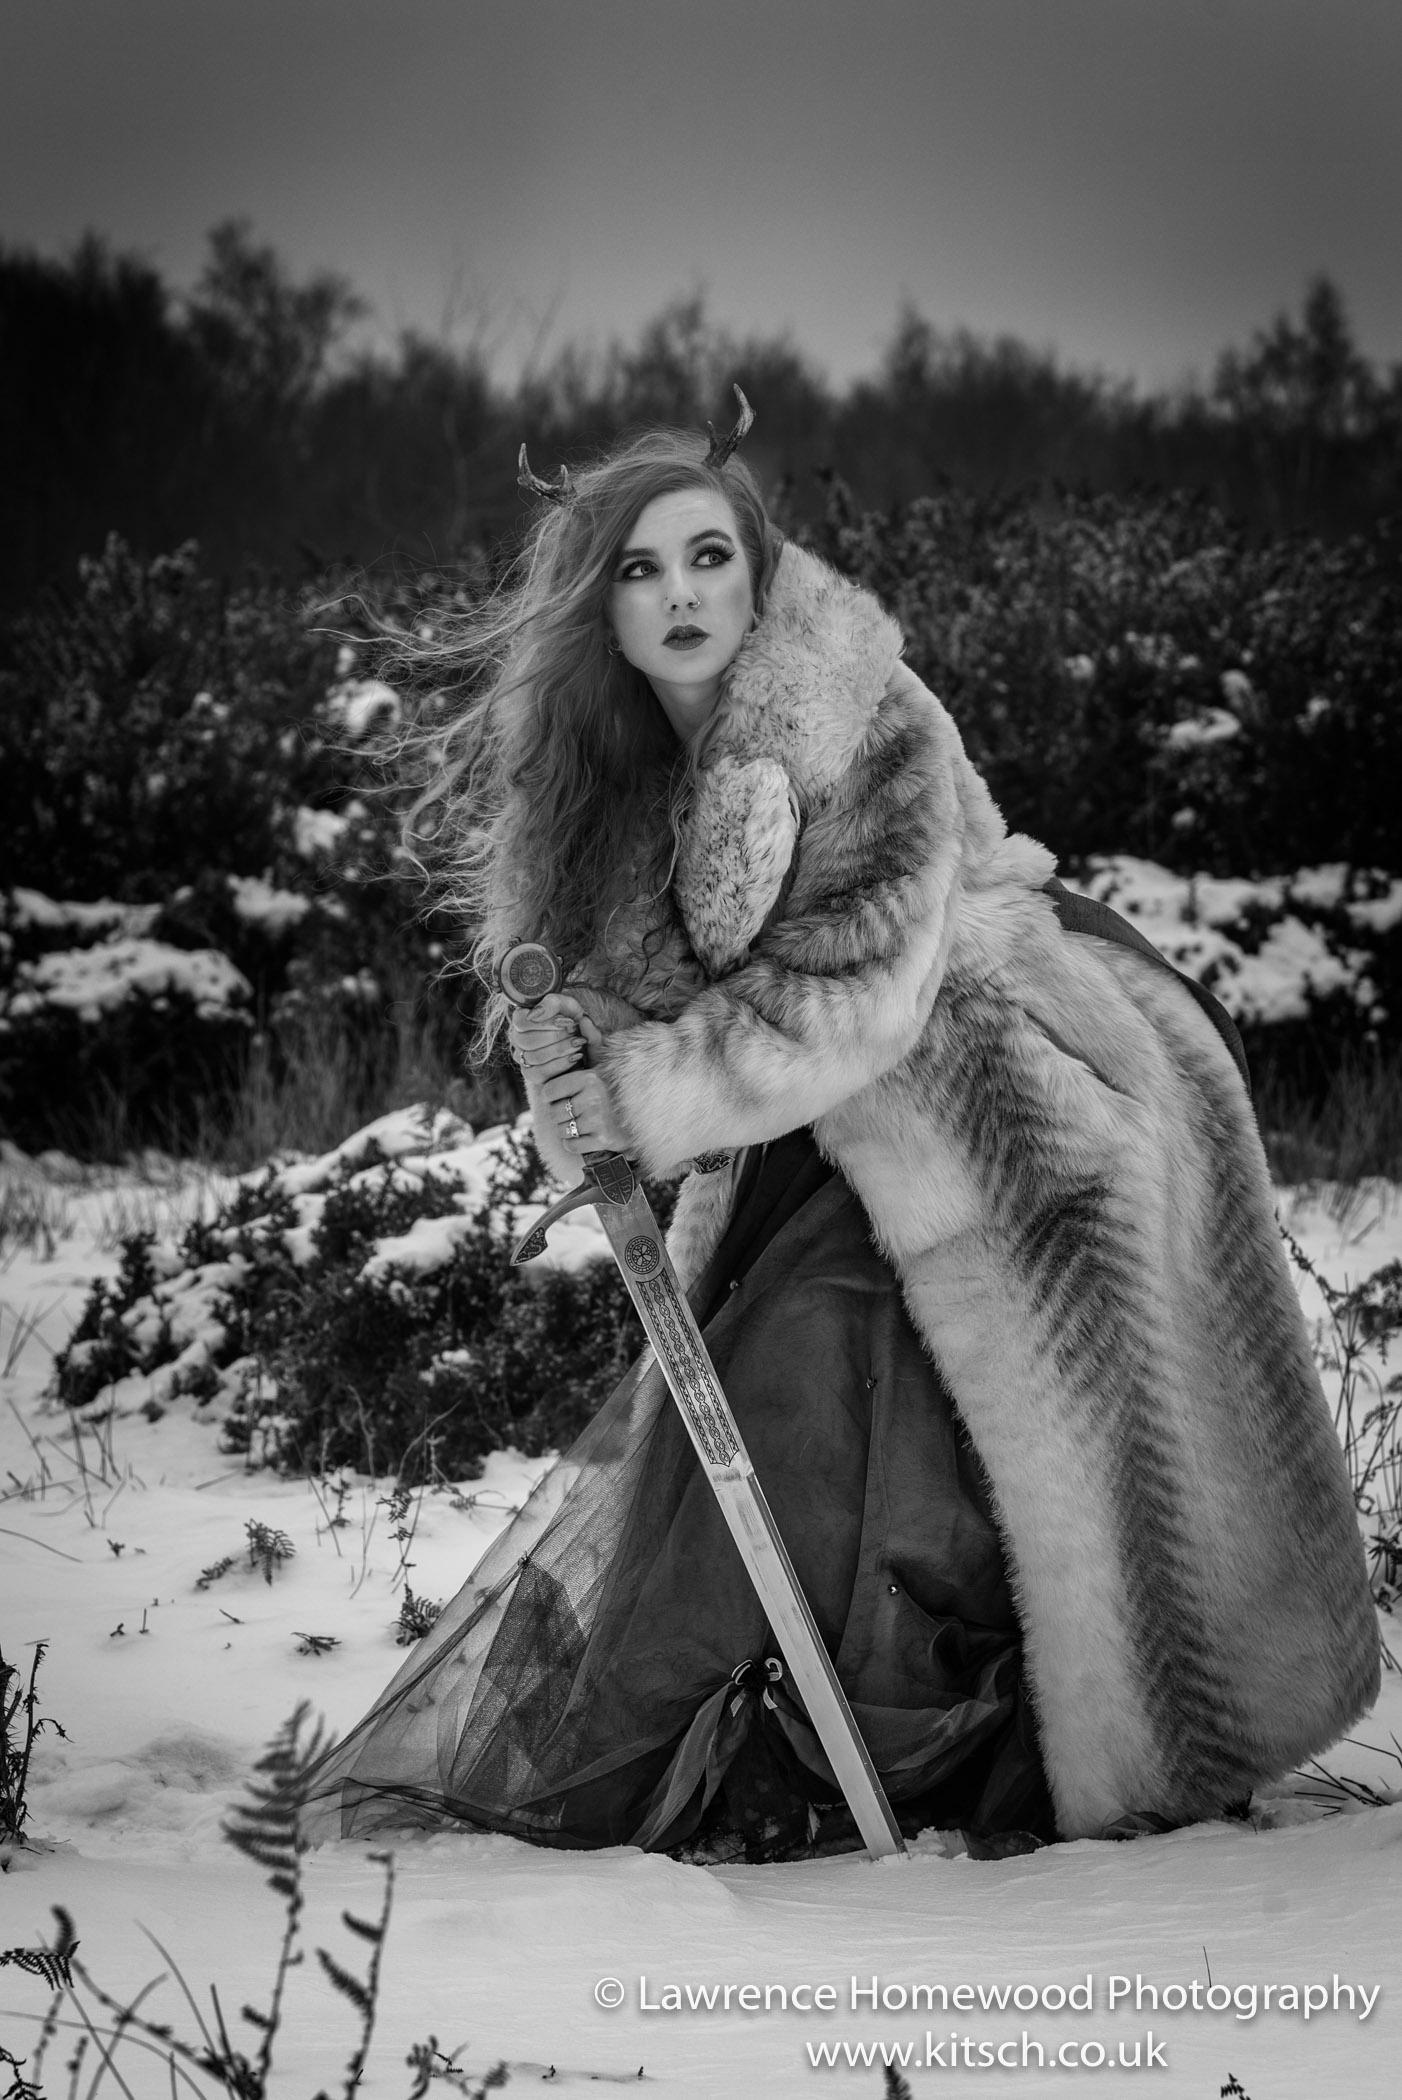 Fawn Princess - A Winters Tale21